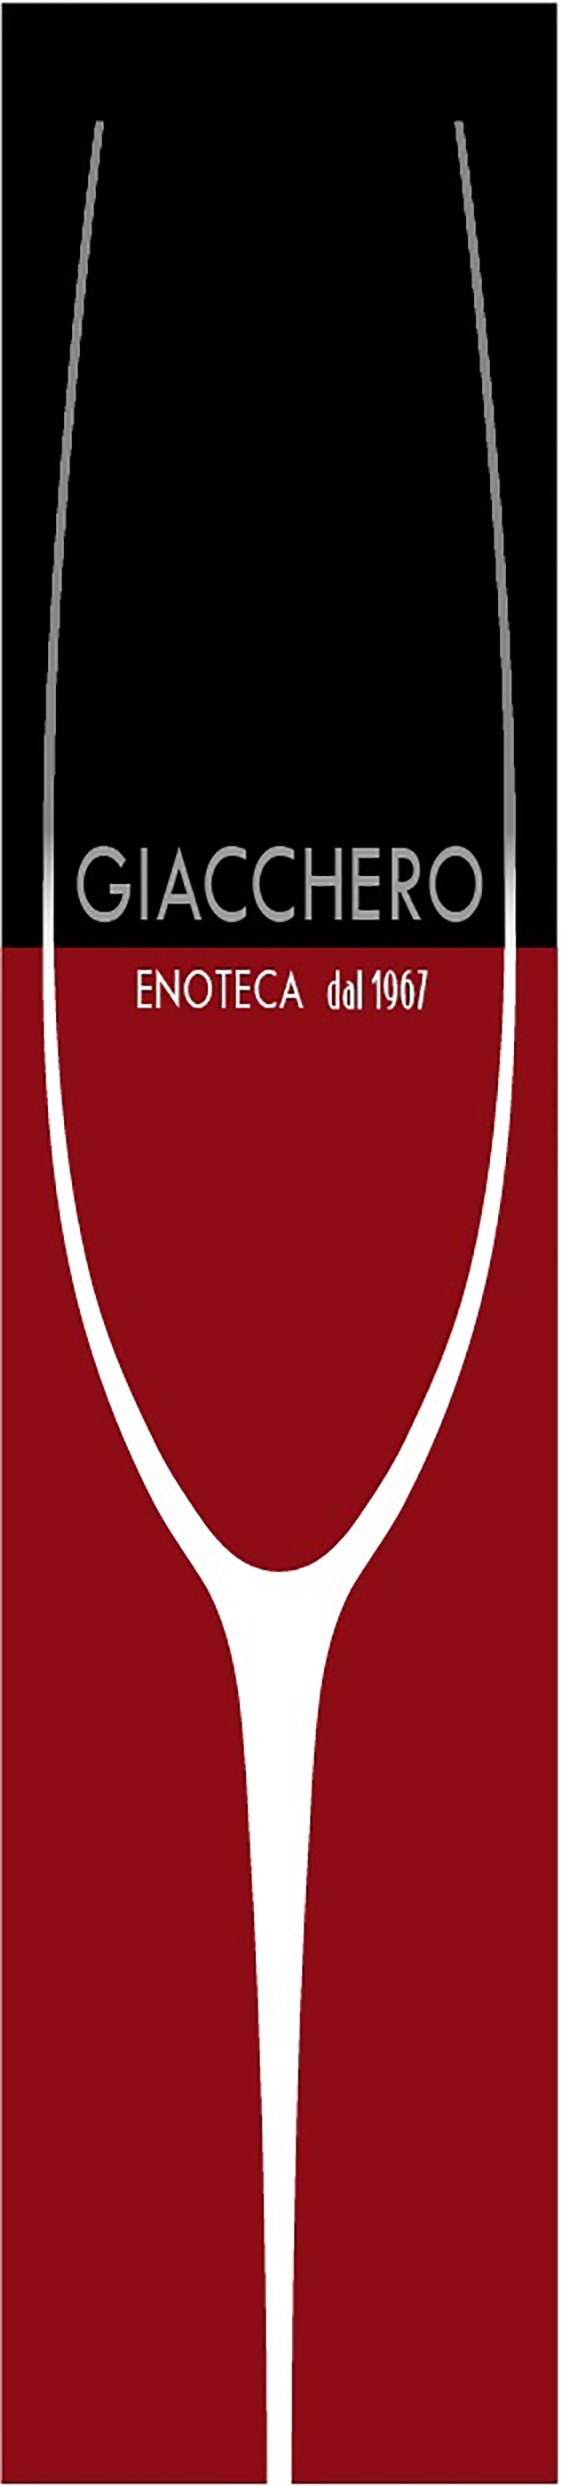 www.giacchero.it